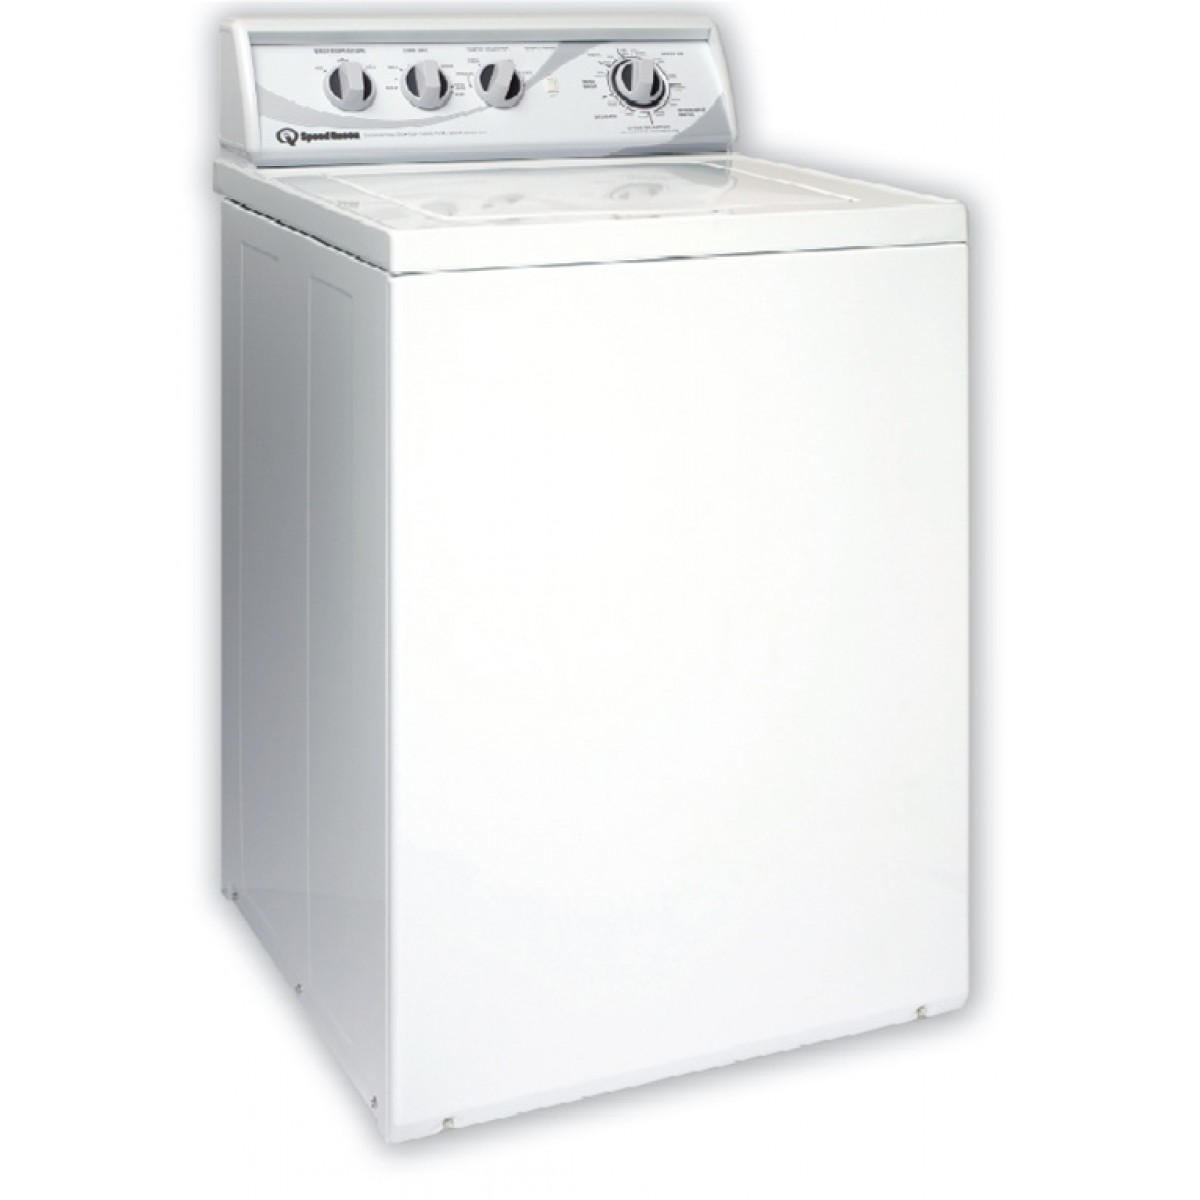 speed queen washing machine diagram speed queen agitator